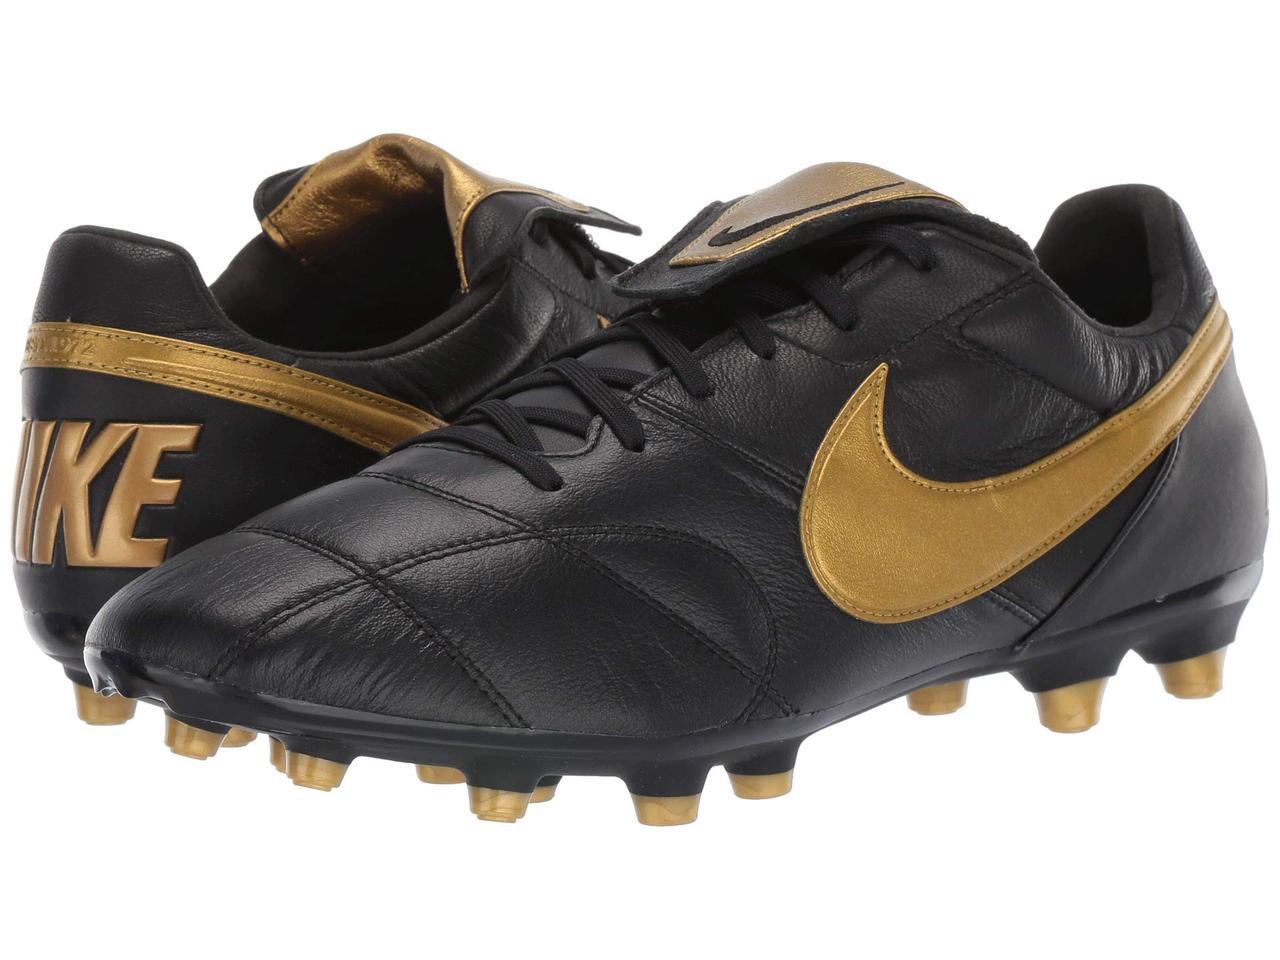 6e7ef3acbf8e Кроссовки/Кеды (Оригинал) Nike Premier II FG Black/Metallic Vivid Gold/